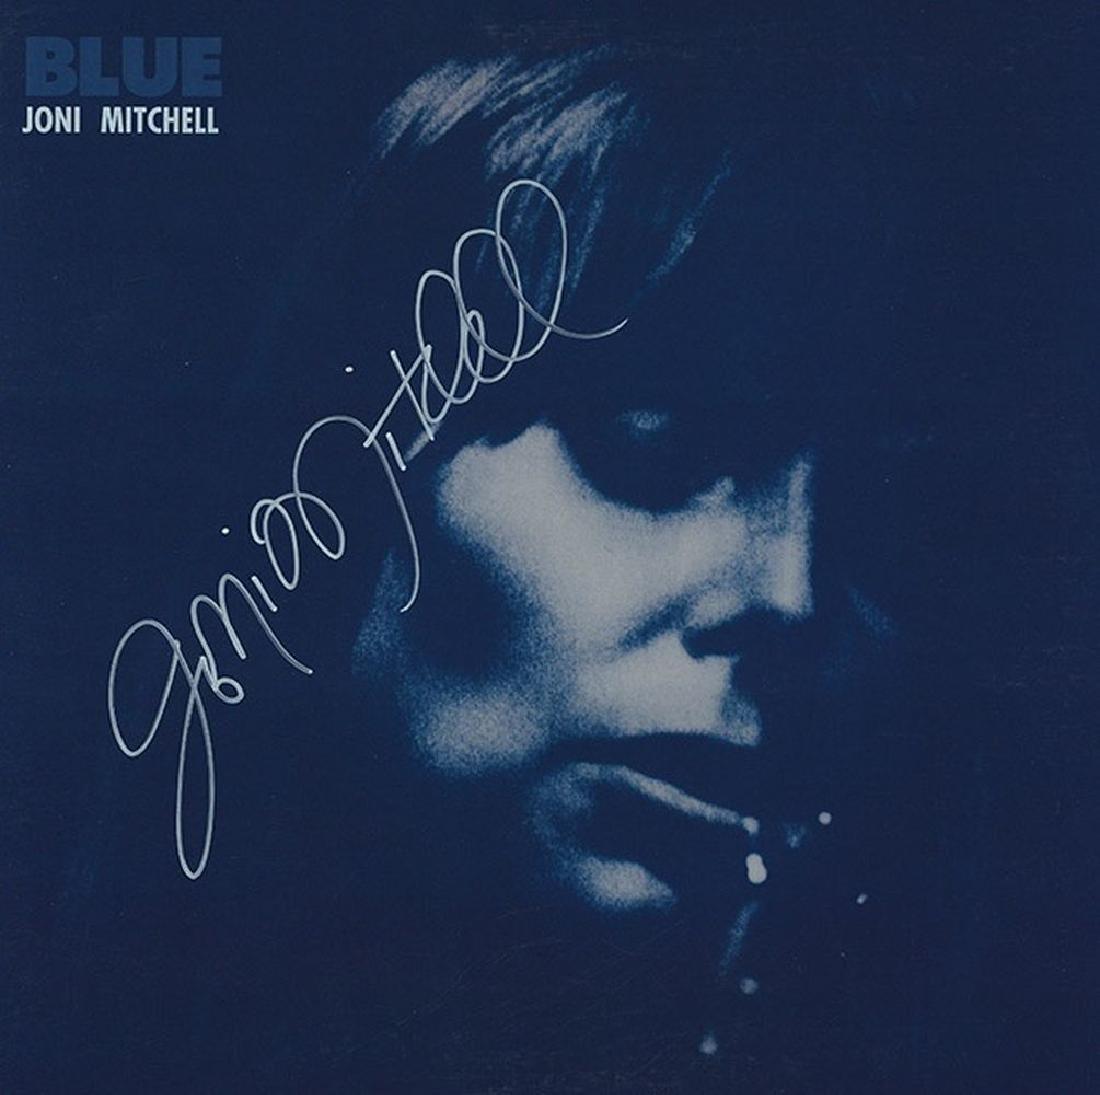 Joni Mitchell Signed Blue Album